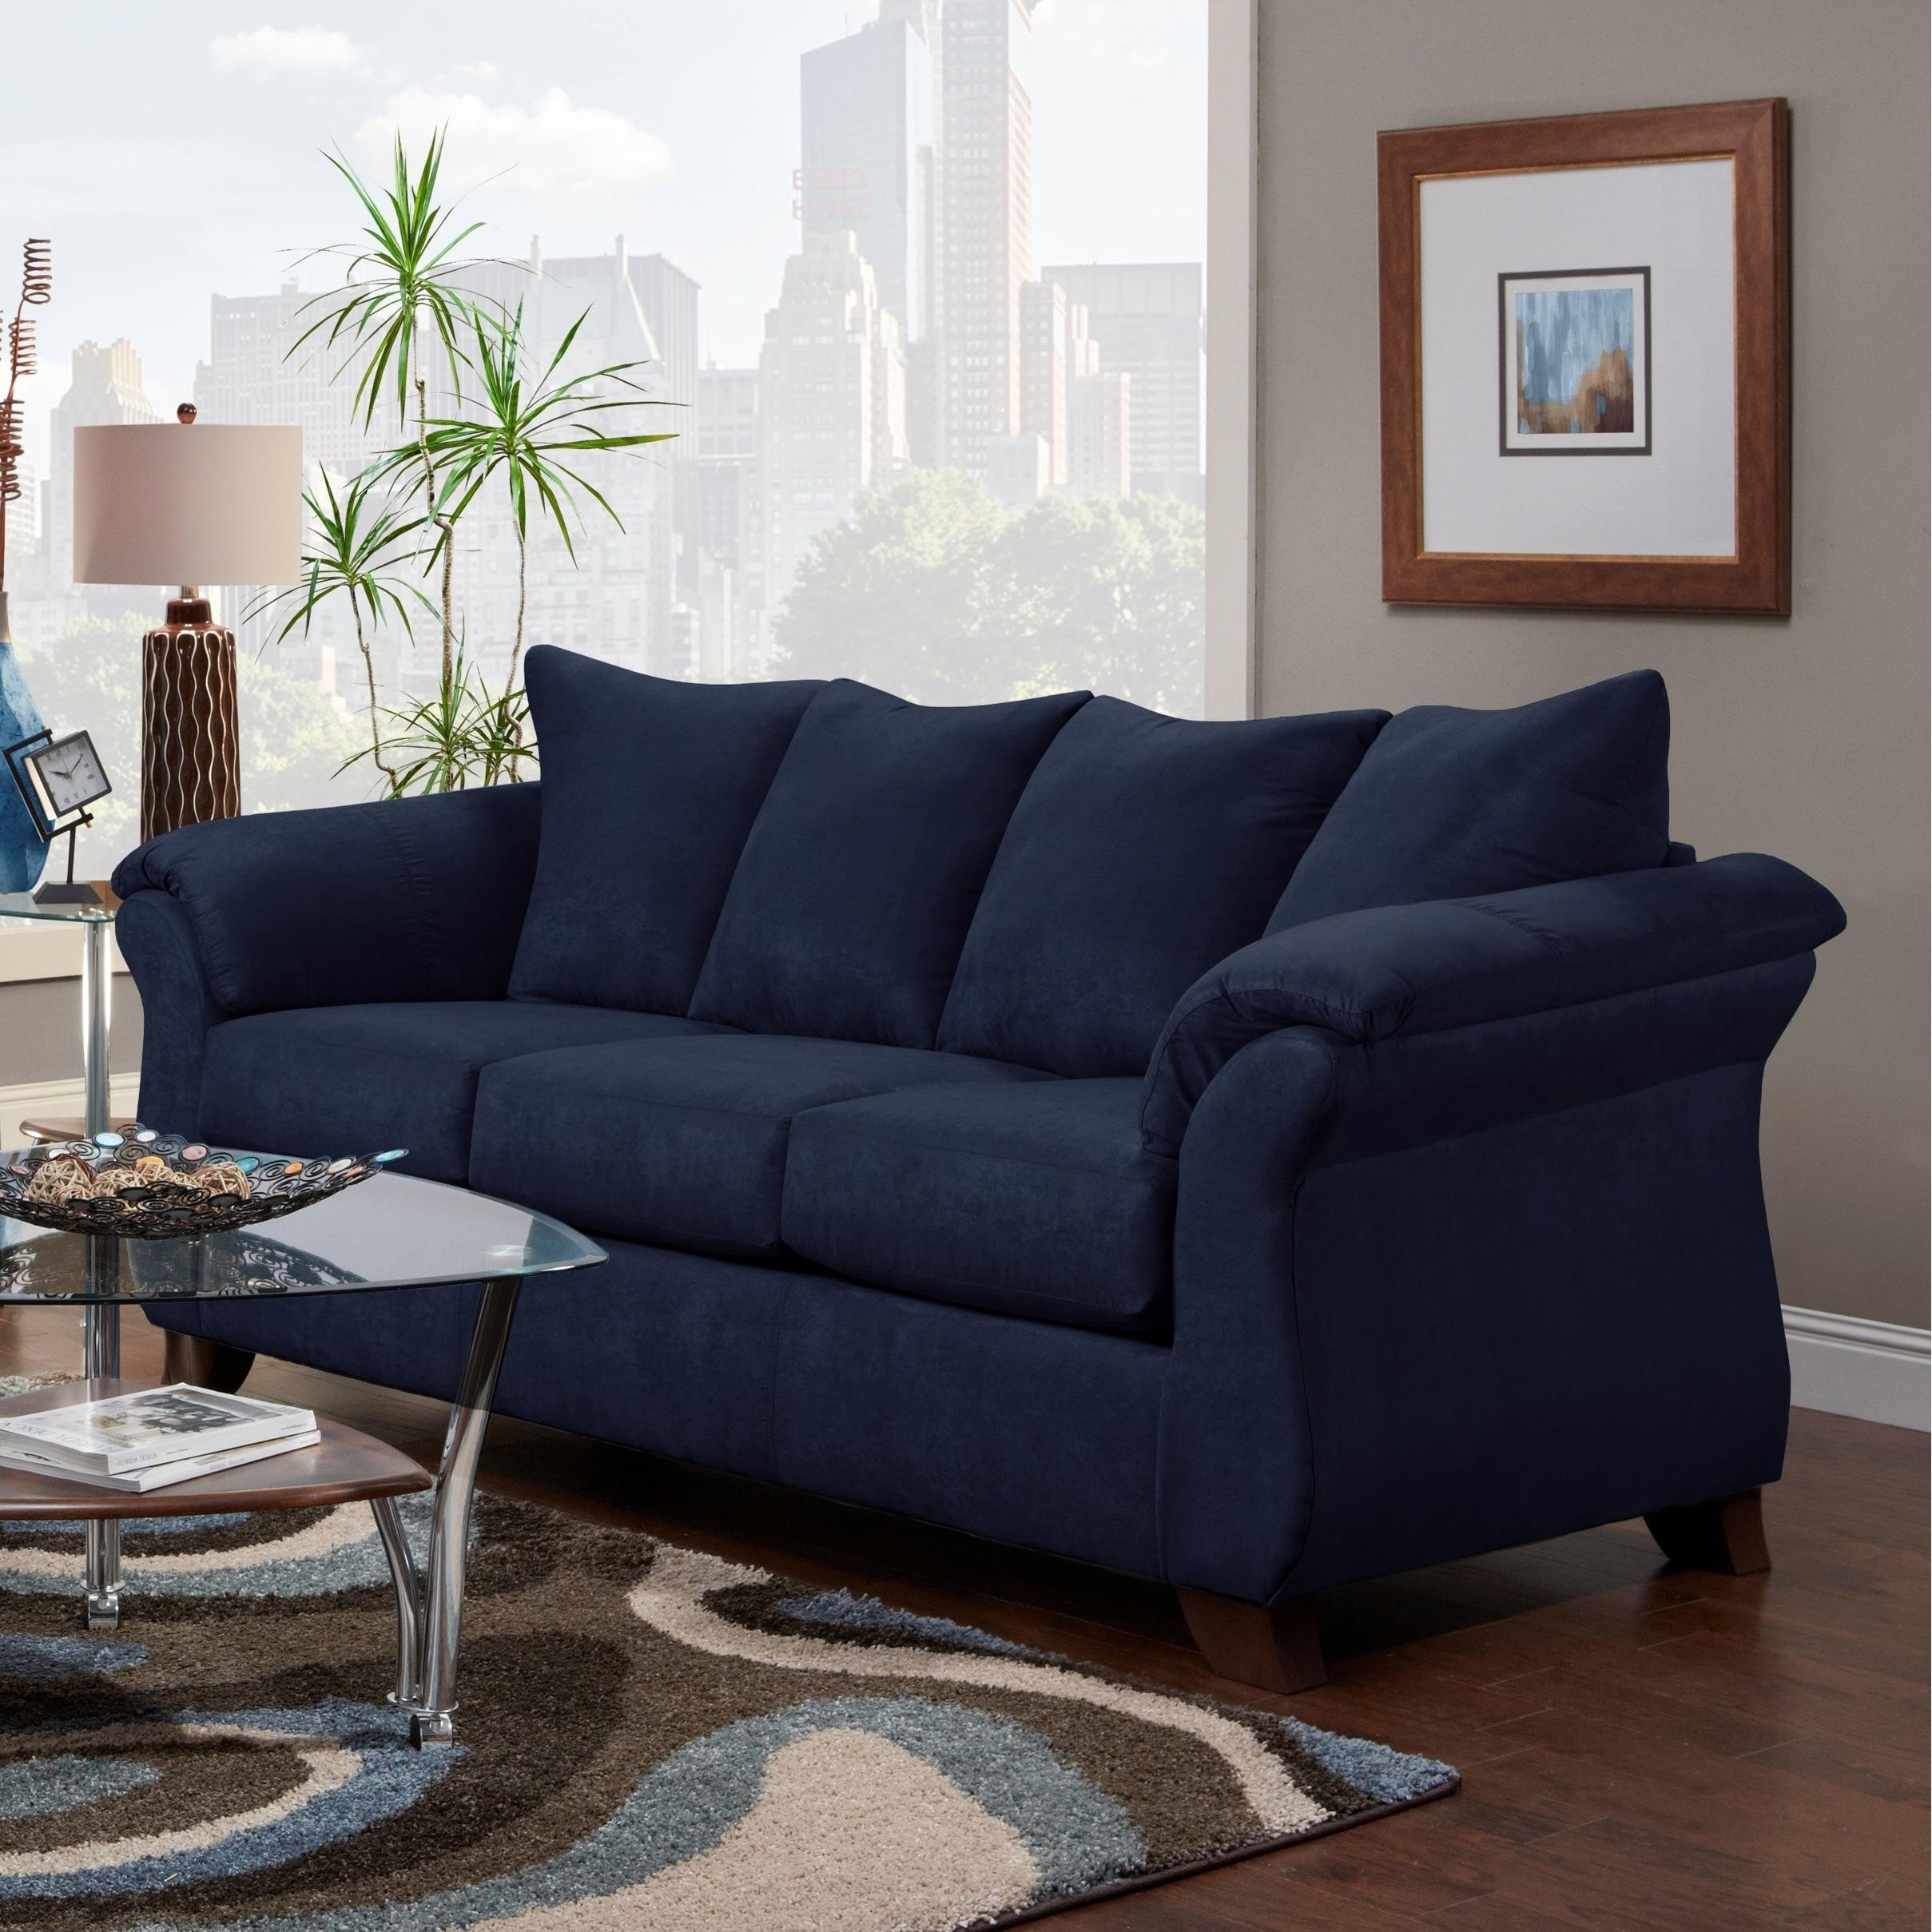 Aruca Navy Blue Microfiber Pillow-back Sofa